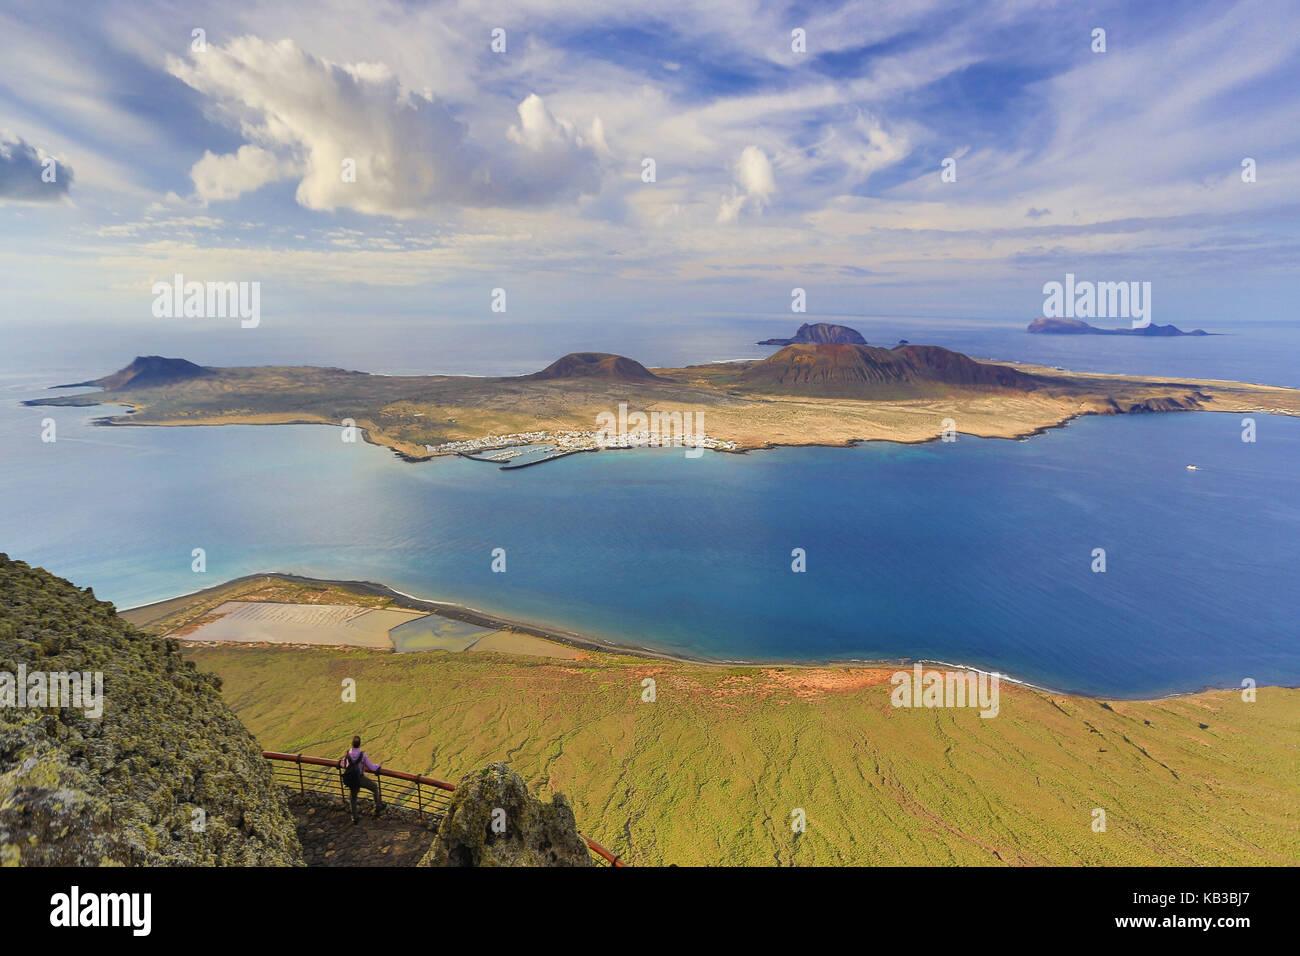 Spanien, Kanarische Inseln, Lanzarote, Mirador del Rio, Isla Graciosa, Naturpark Chinijo, Stockbild